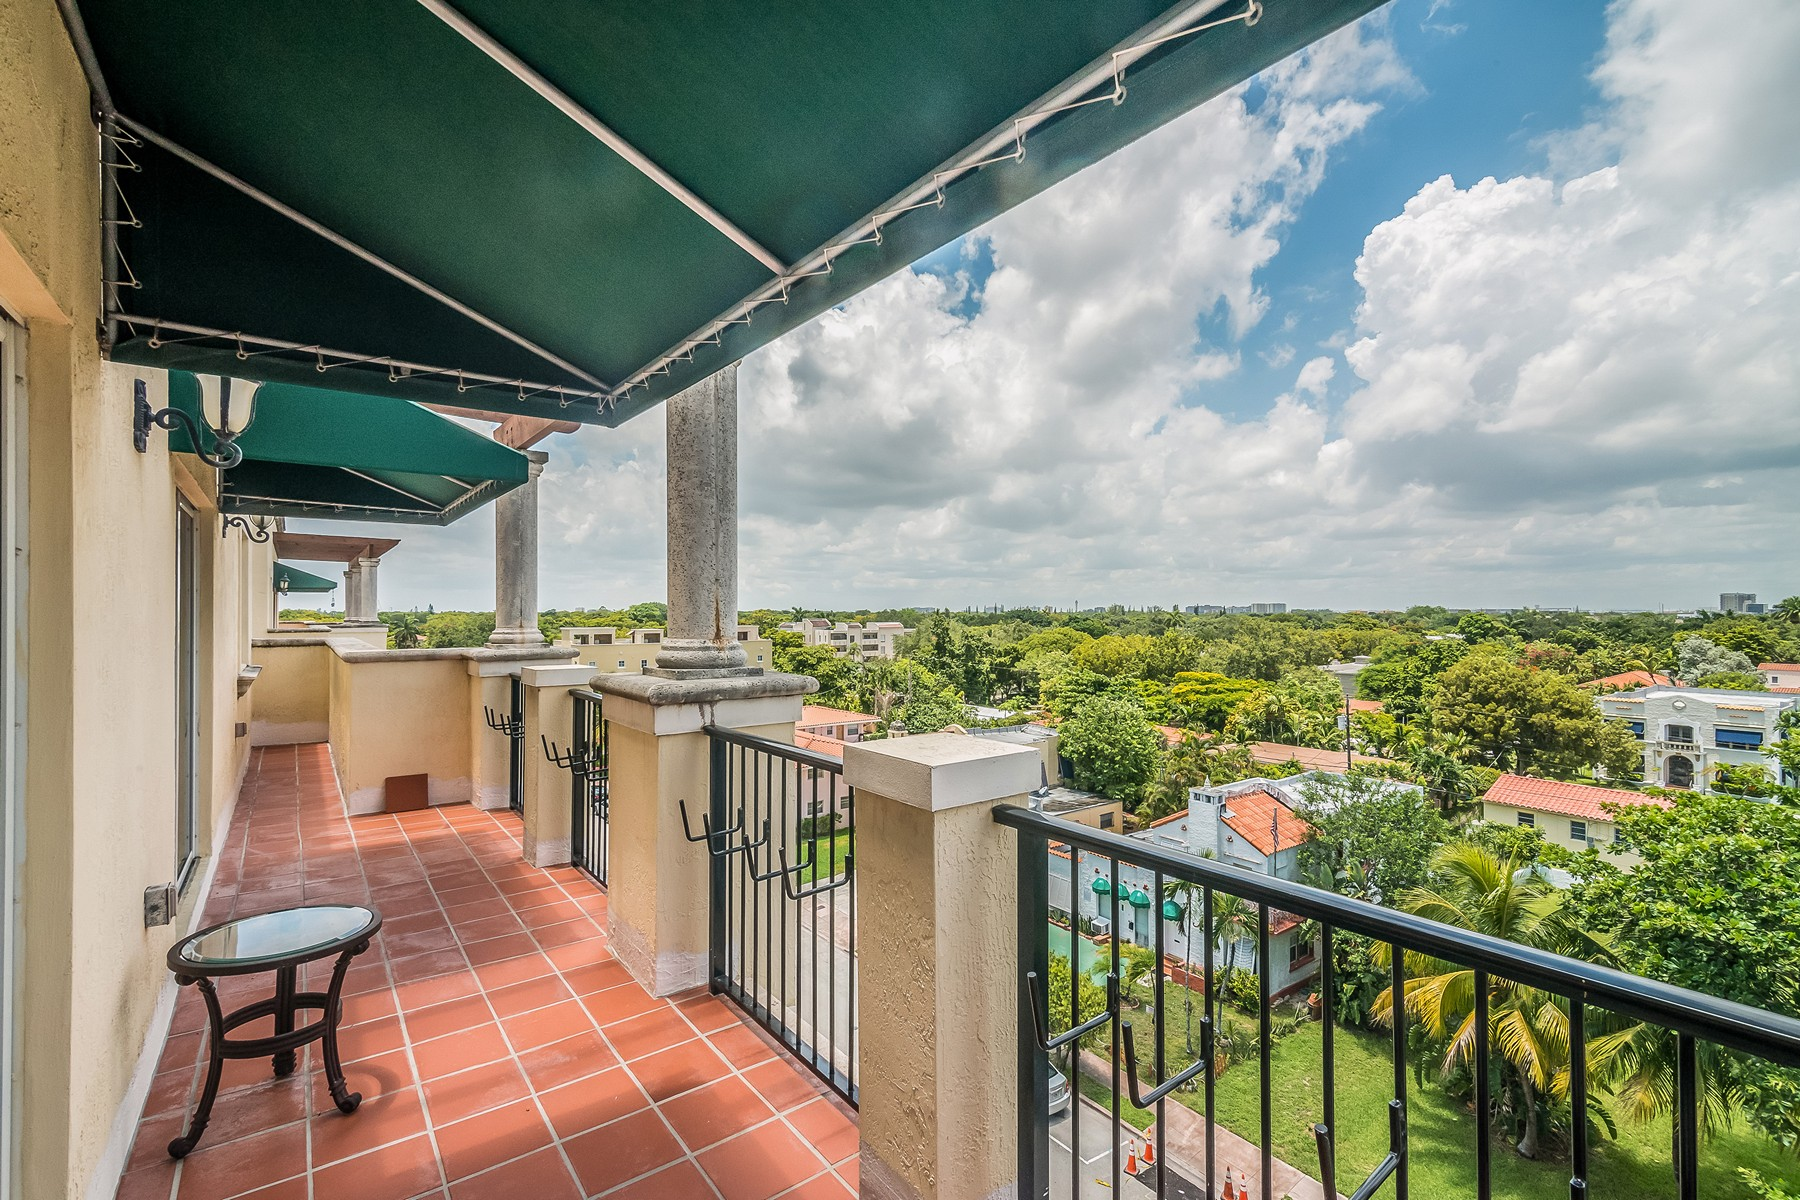 Apartamento para Venda às 322 Madeira Ave #PH 101 Coral Gables, Florida 33134 Estados Unidos